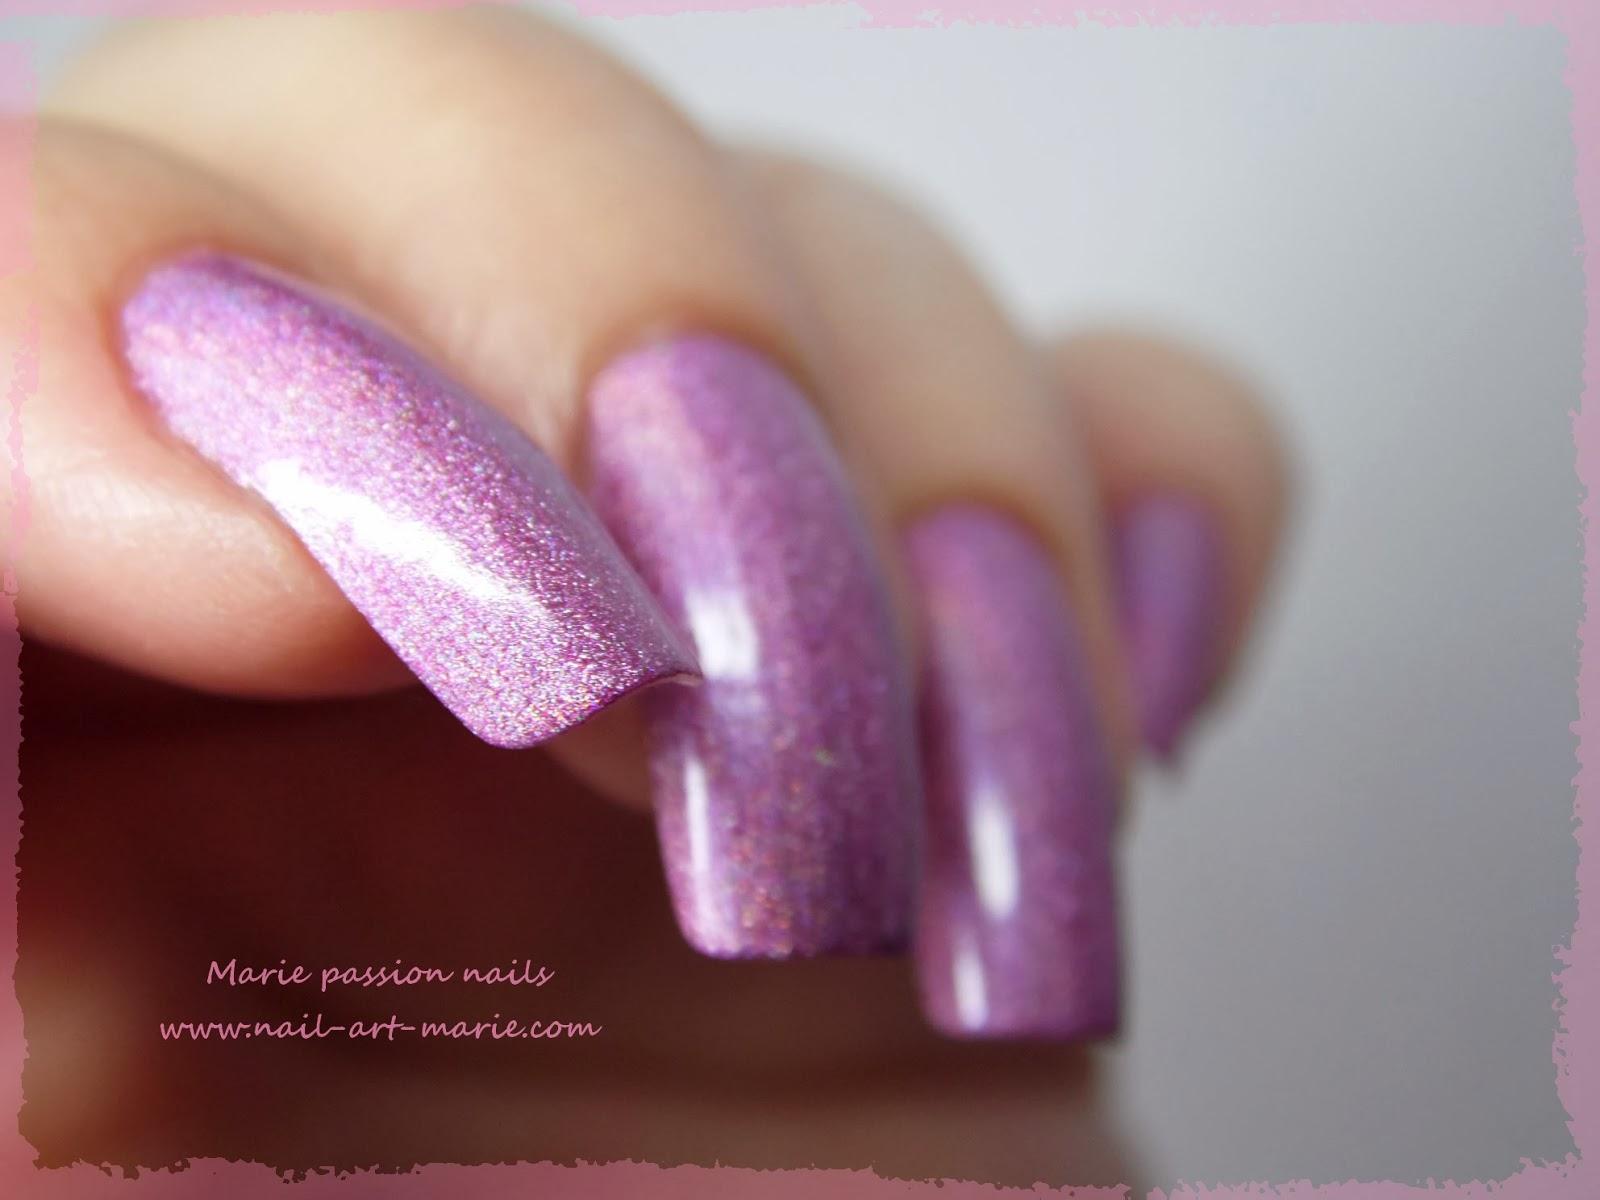 LM Cosmetic Izar5